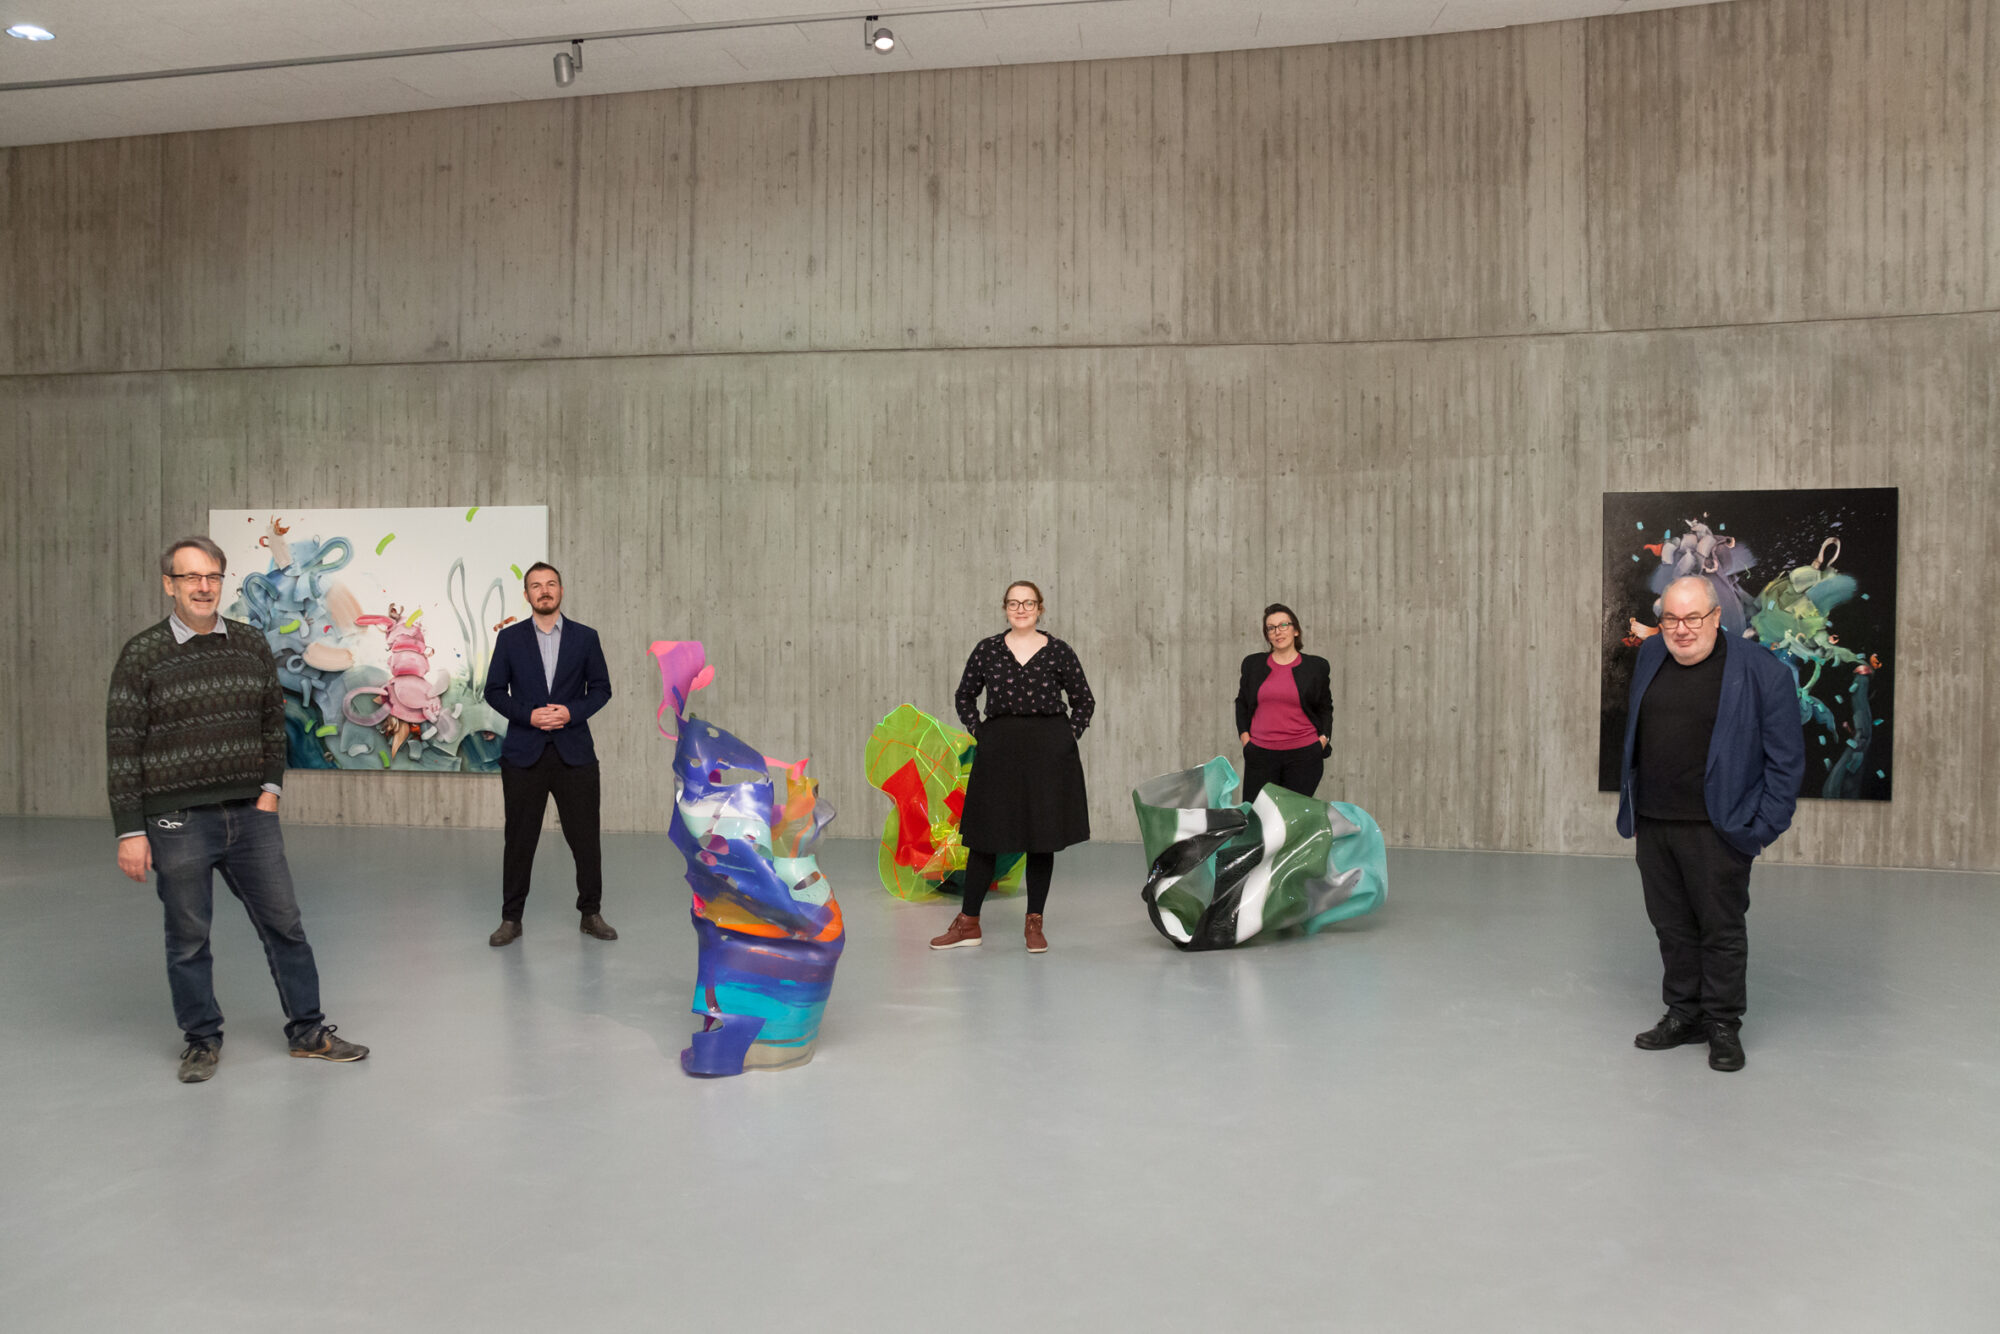 Paul Schwer, Wilko Austermann, Johanna Flammer, Kasia Lorenc und Gerd Weggel. Foto: Hanne Brandt